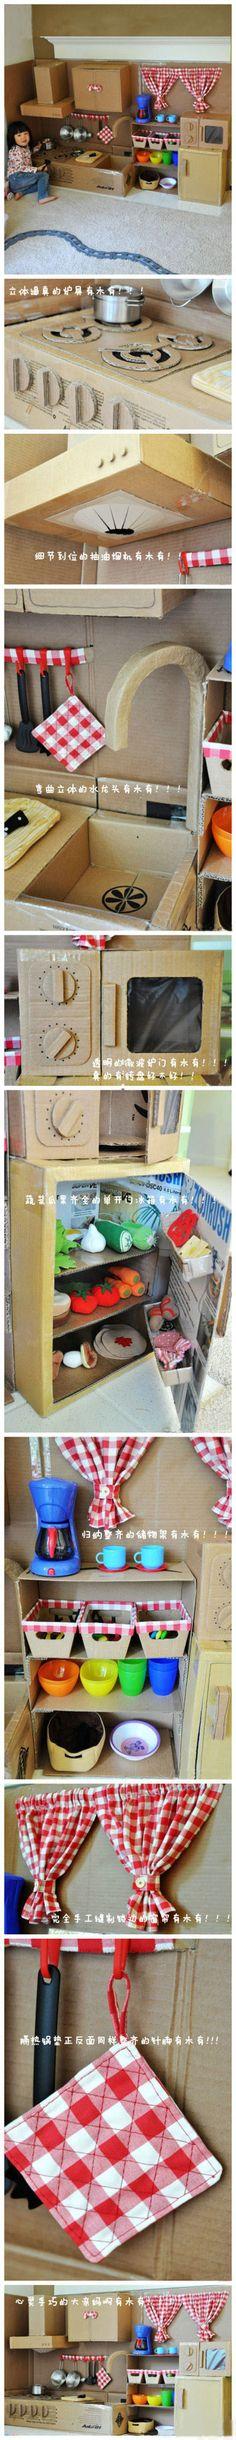 This is a mother handmade cardboard version of mini kitchen, cute | diyfunidea.com